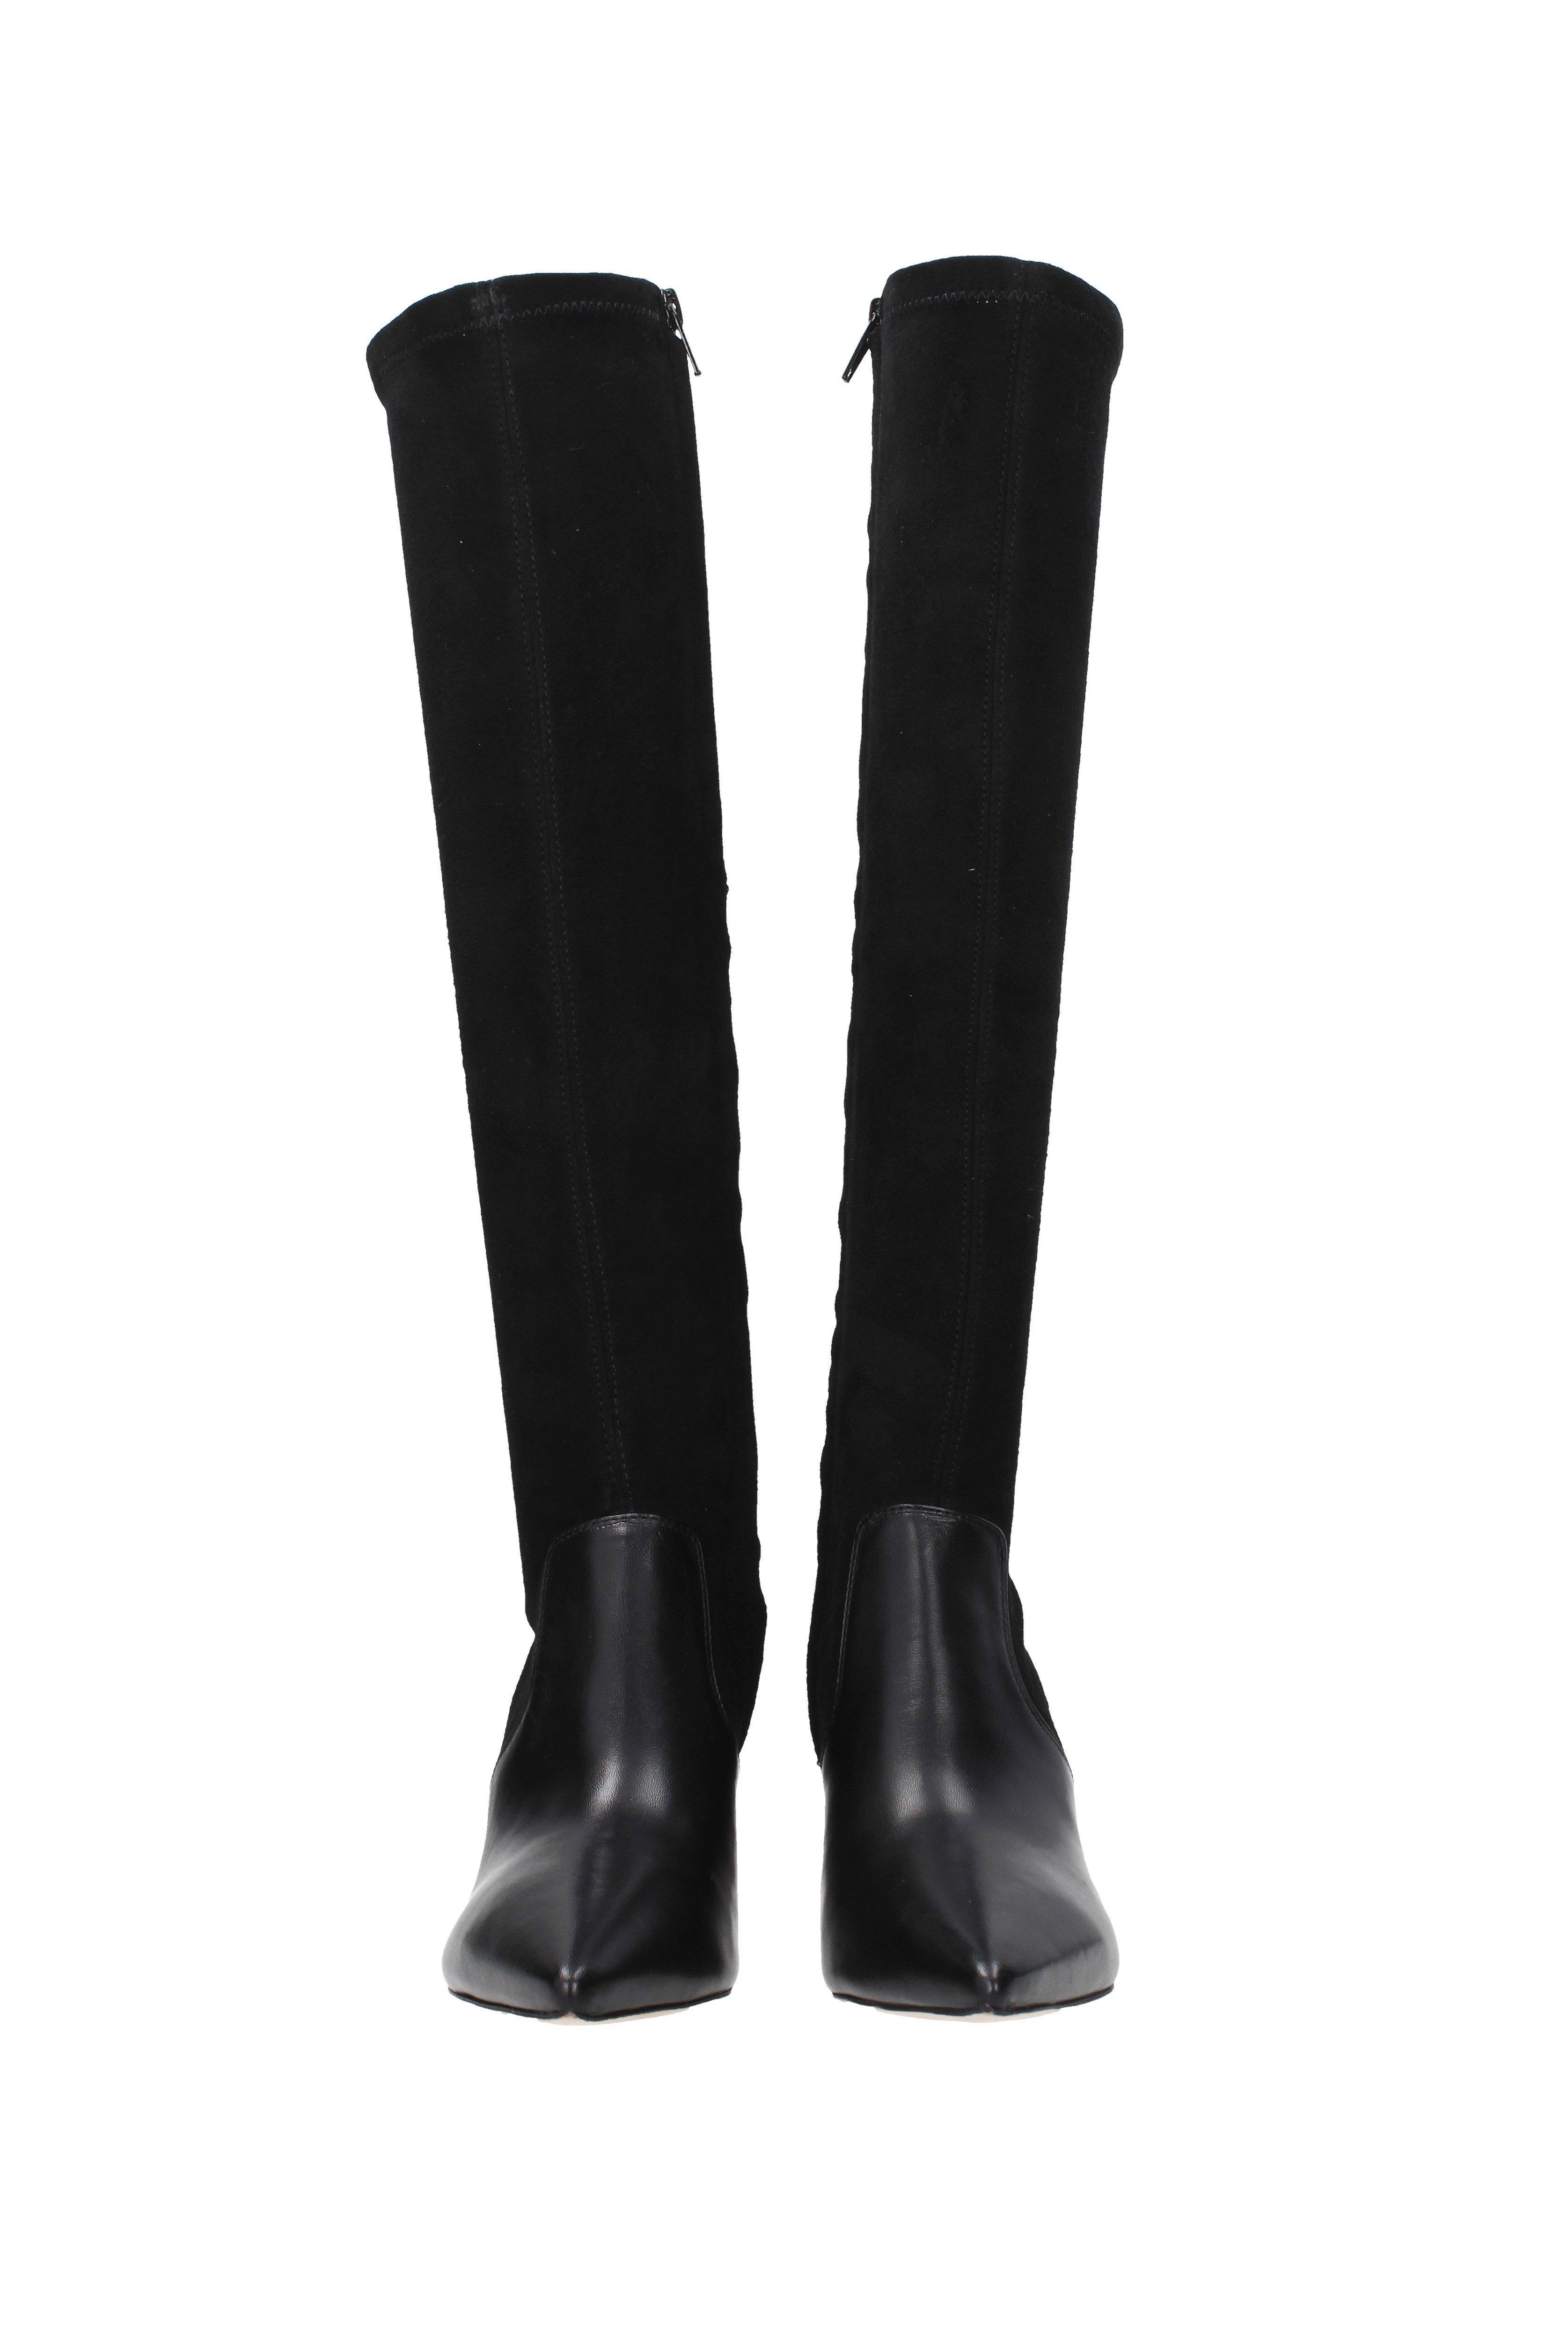 f98b4d89074 Lyst - Tory Burch Boots Georgina Women Black in Black